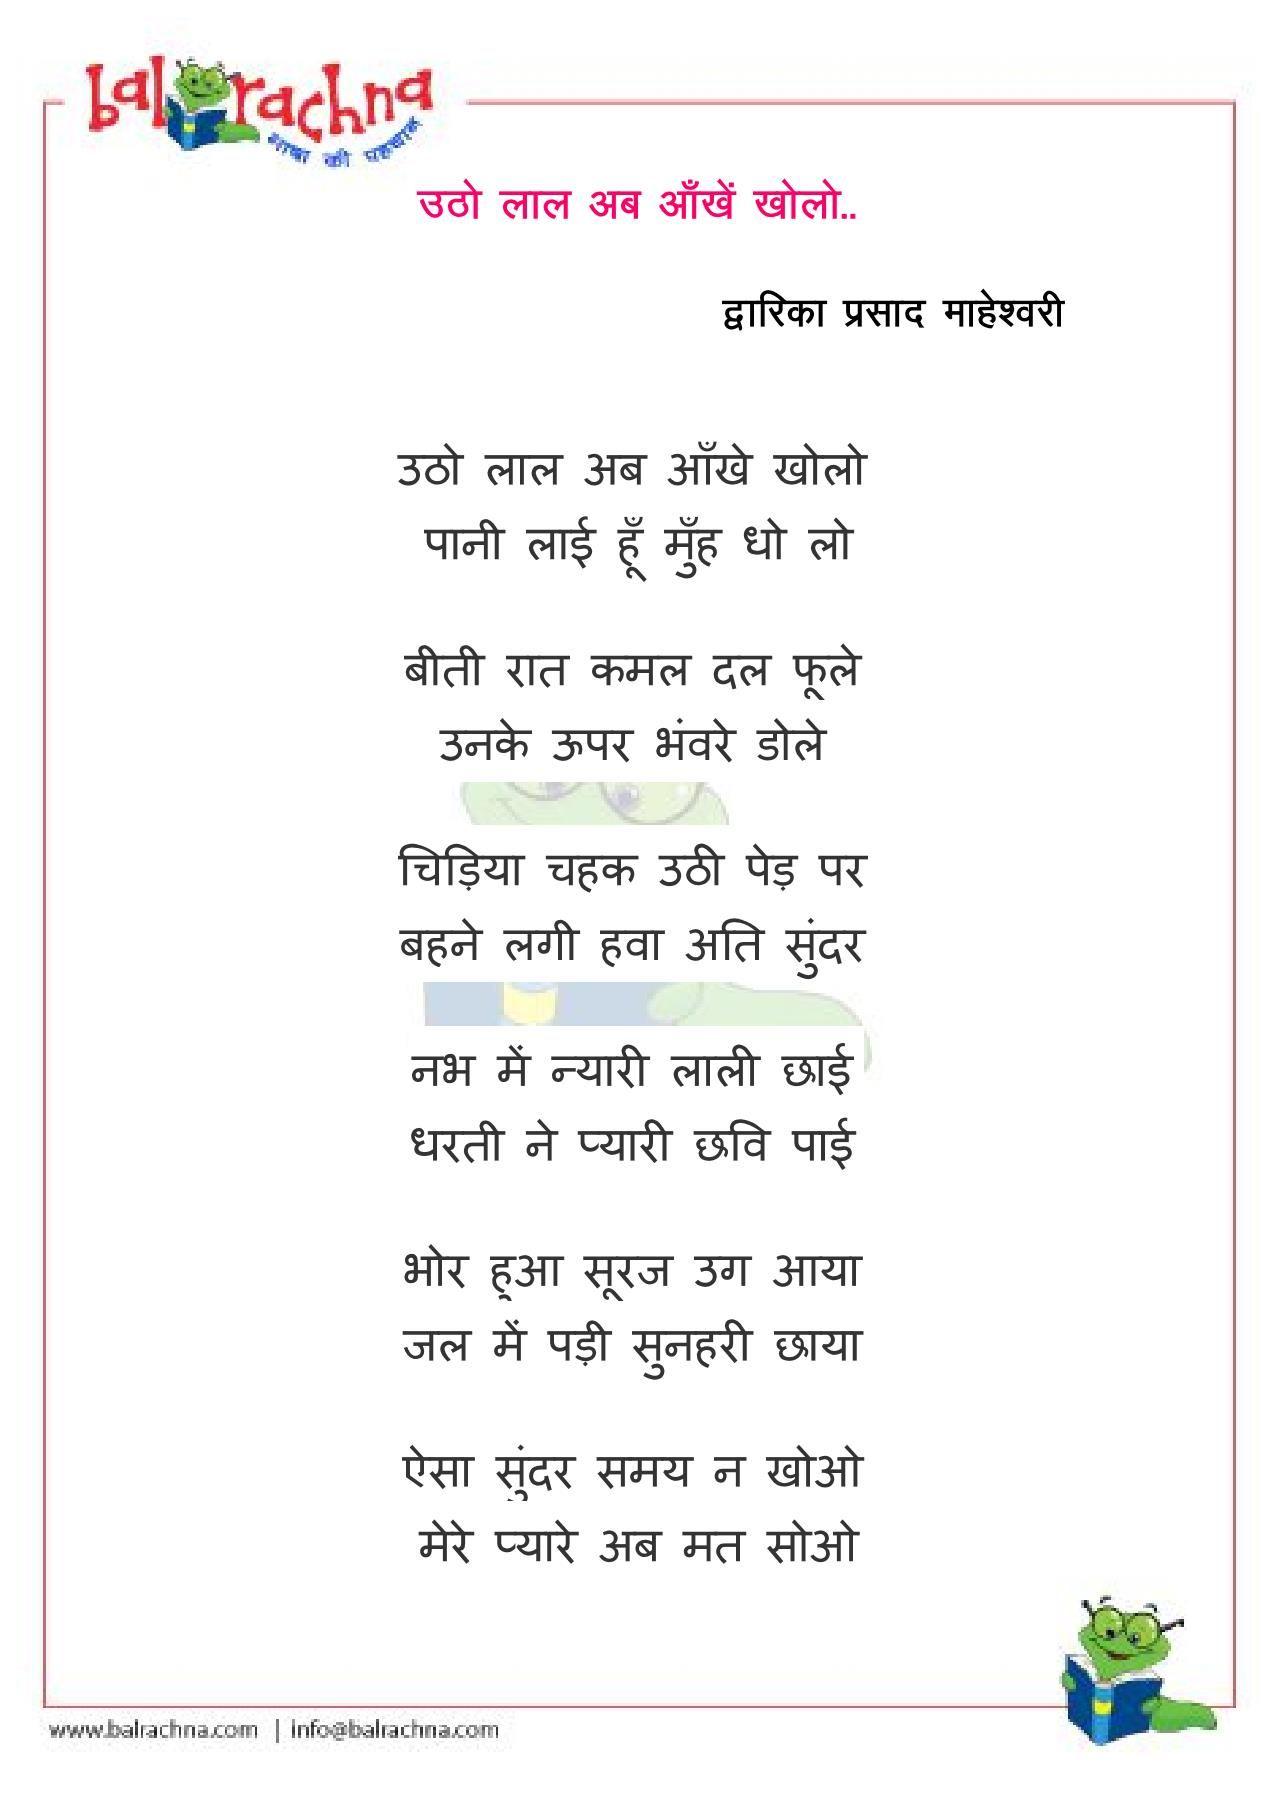 Pin By Rachna Maheshwari On Rachna Maheshwari Hindi Poems For Kids Hindi Poems For Kids Hindi Language Learning Friendship Quotes In Hindi [ 1803 x 1275 Pixel ]